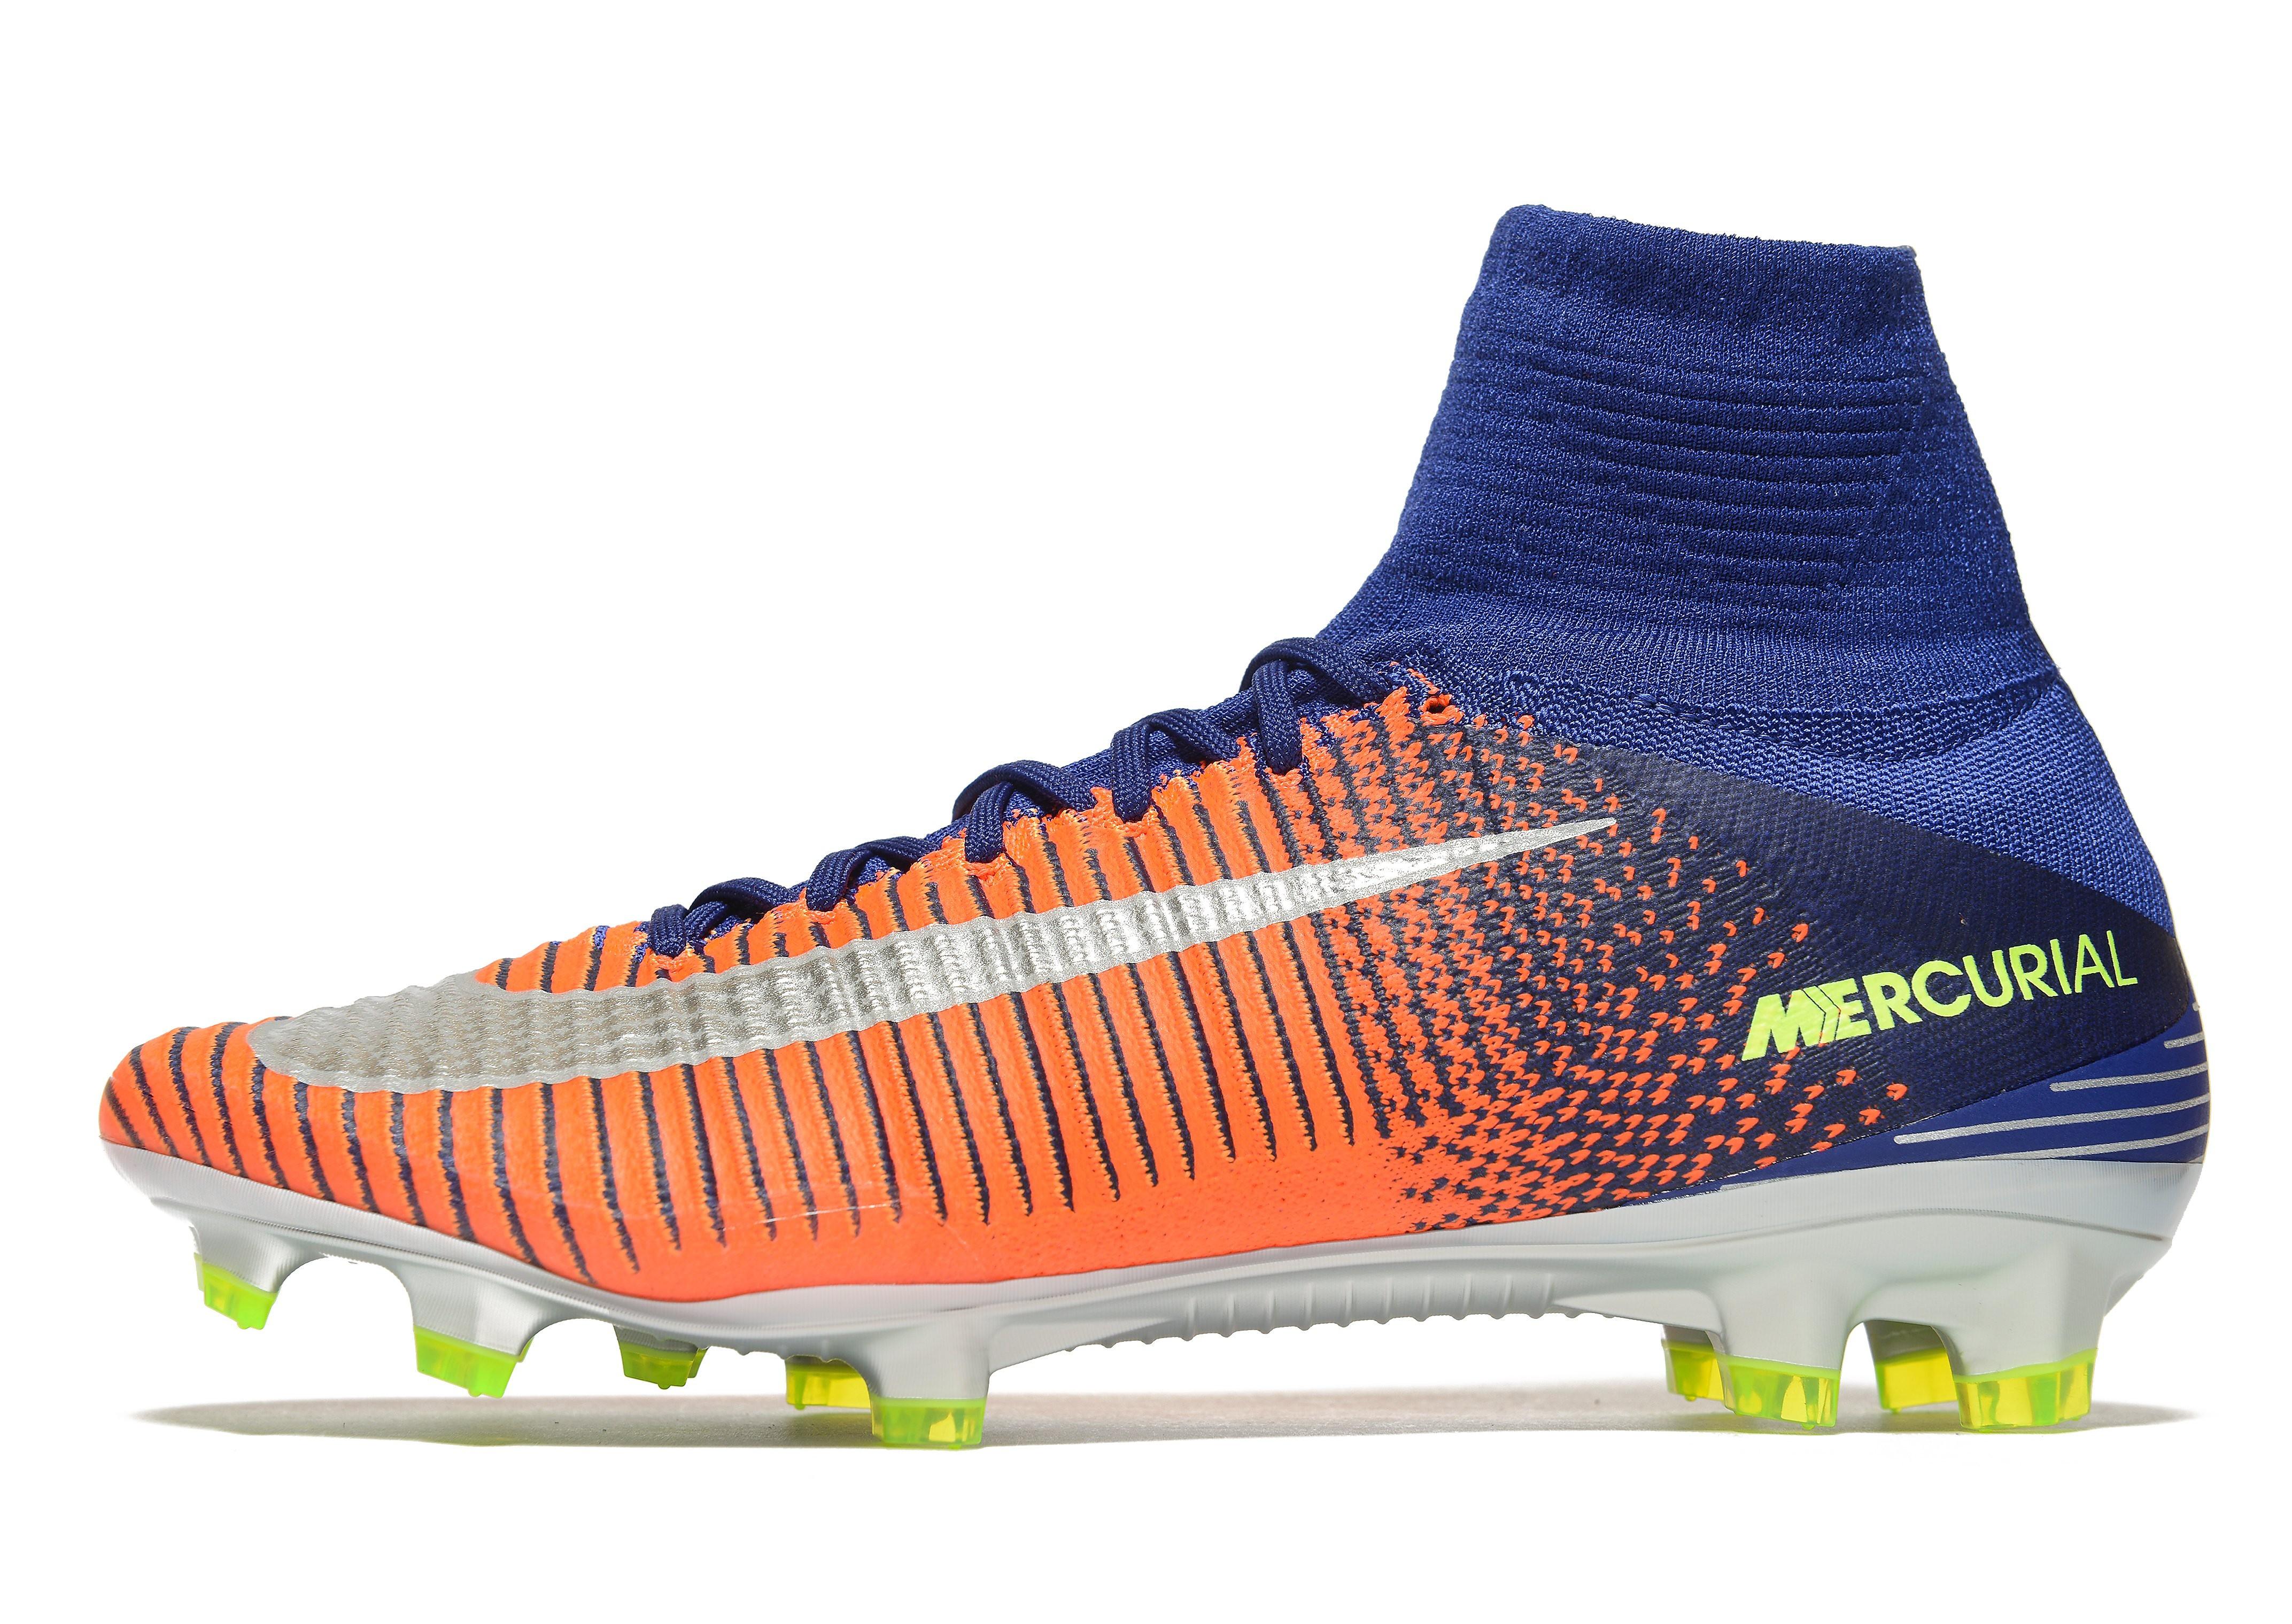 Nike Time To Shine Mercurial Superfly V FG